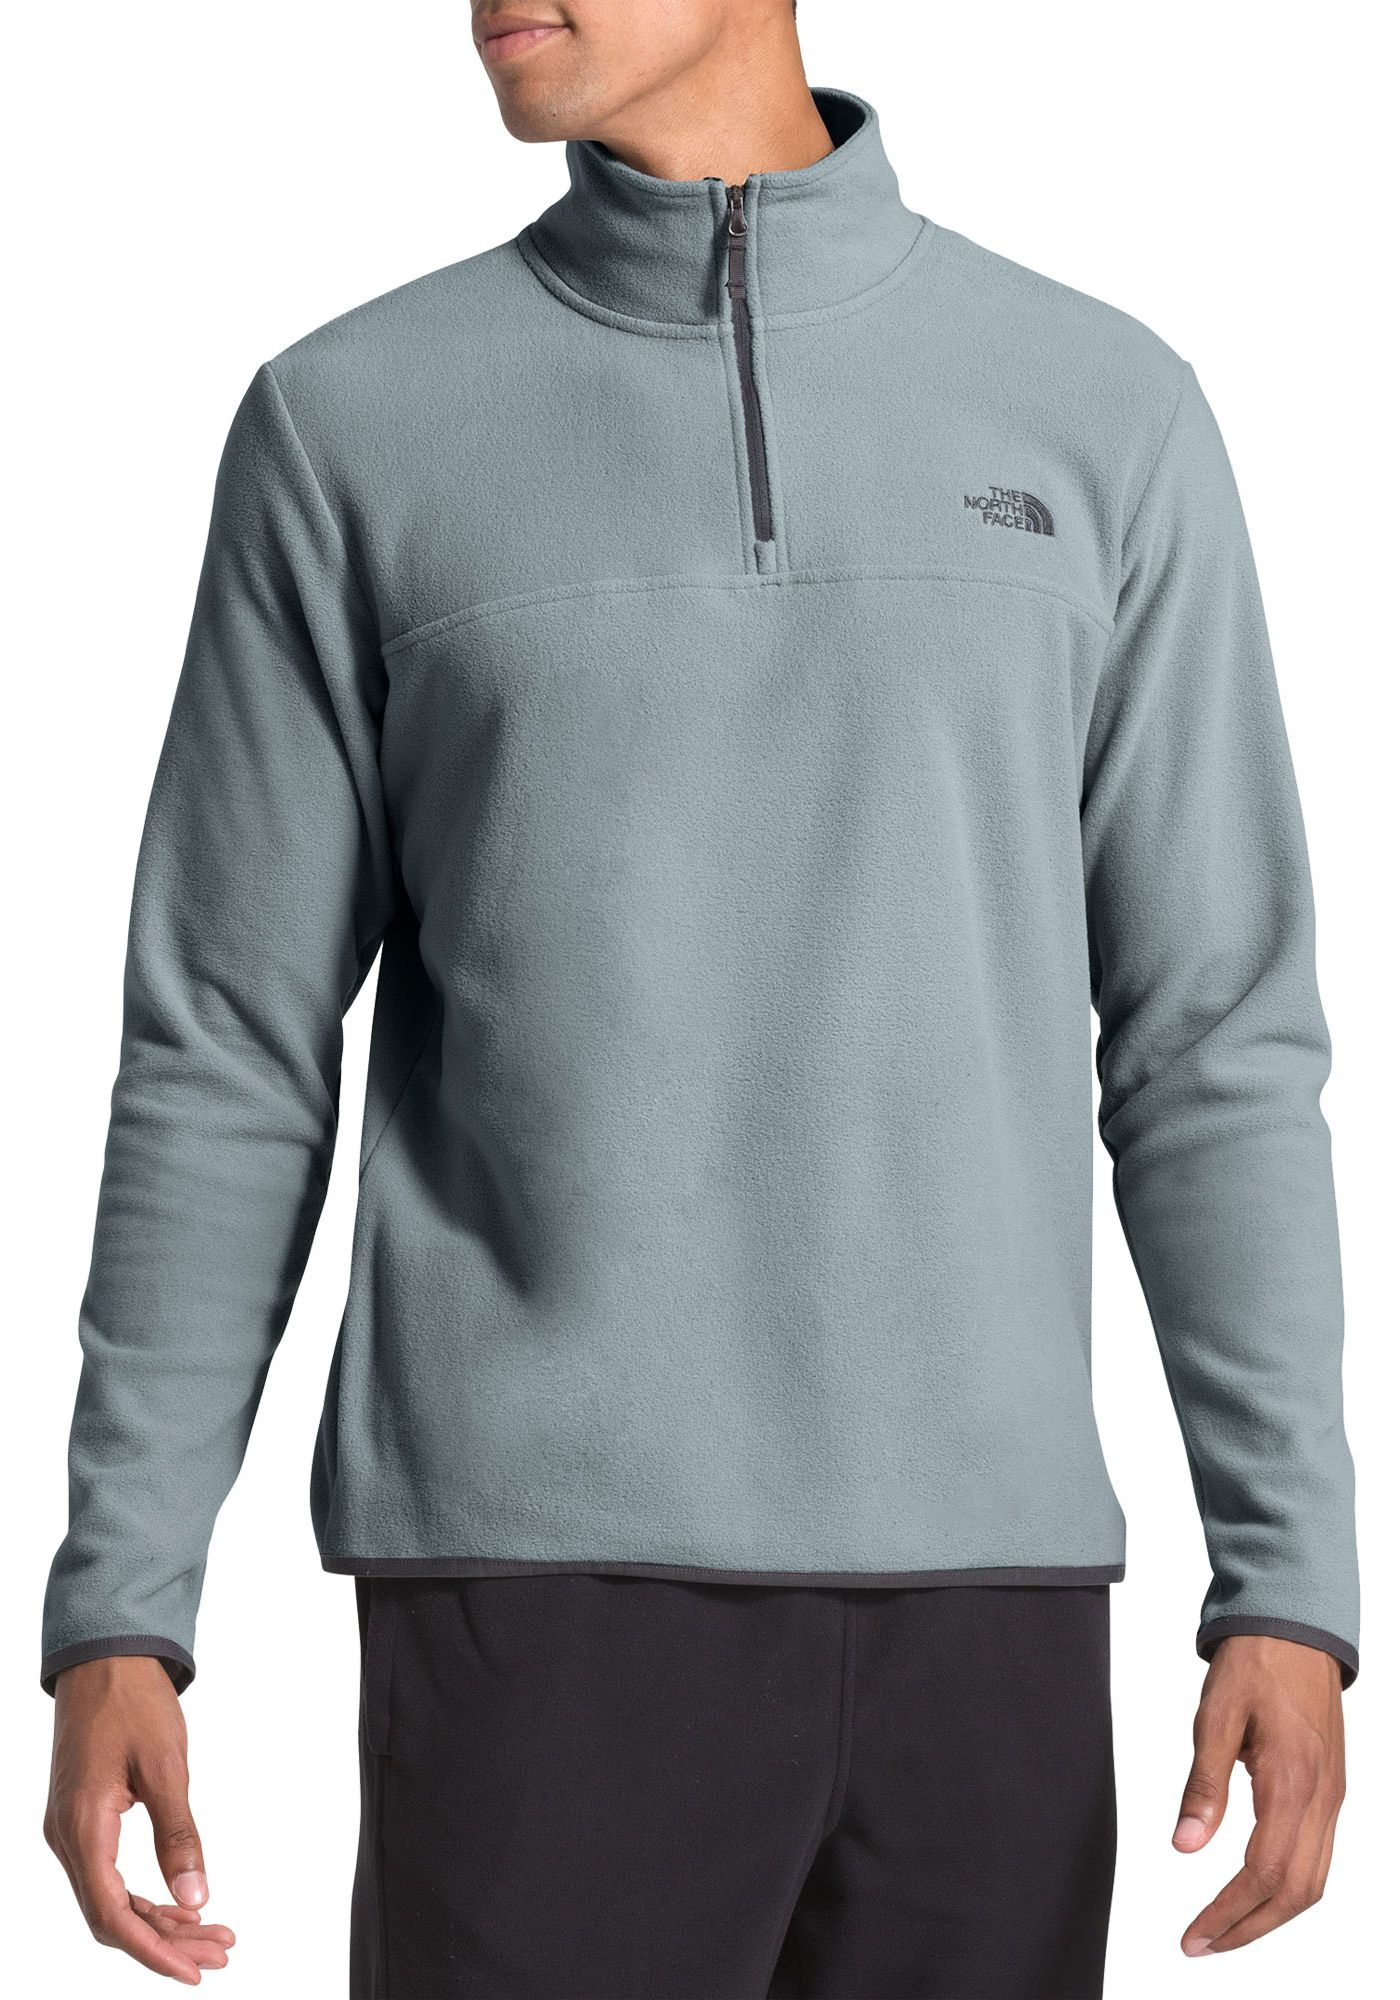 The North Face Men's TKA Glacier ¼ Zip Pullover